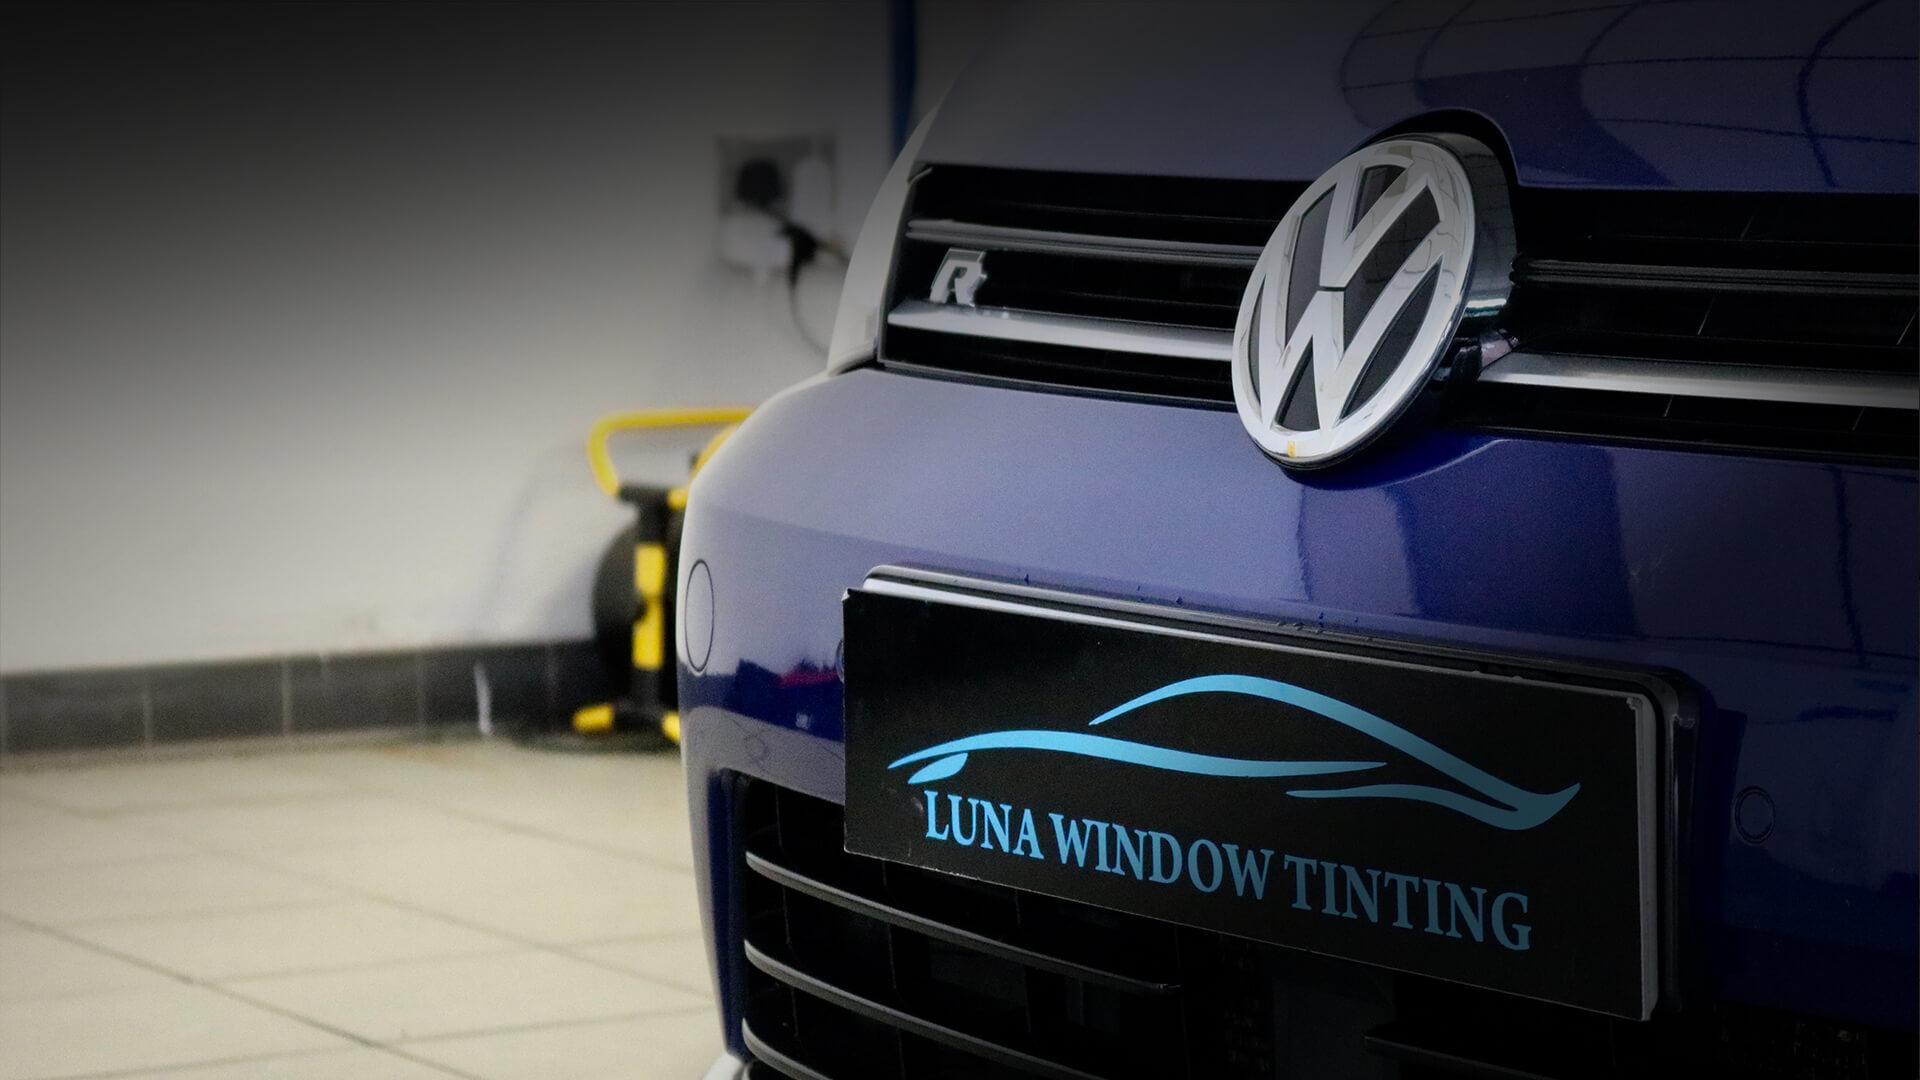 Luna Window Tinting | Car Window Tinting in Manchester